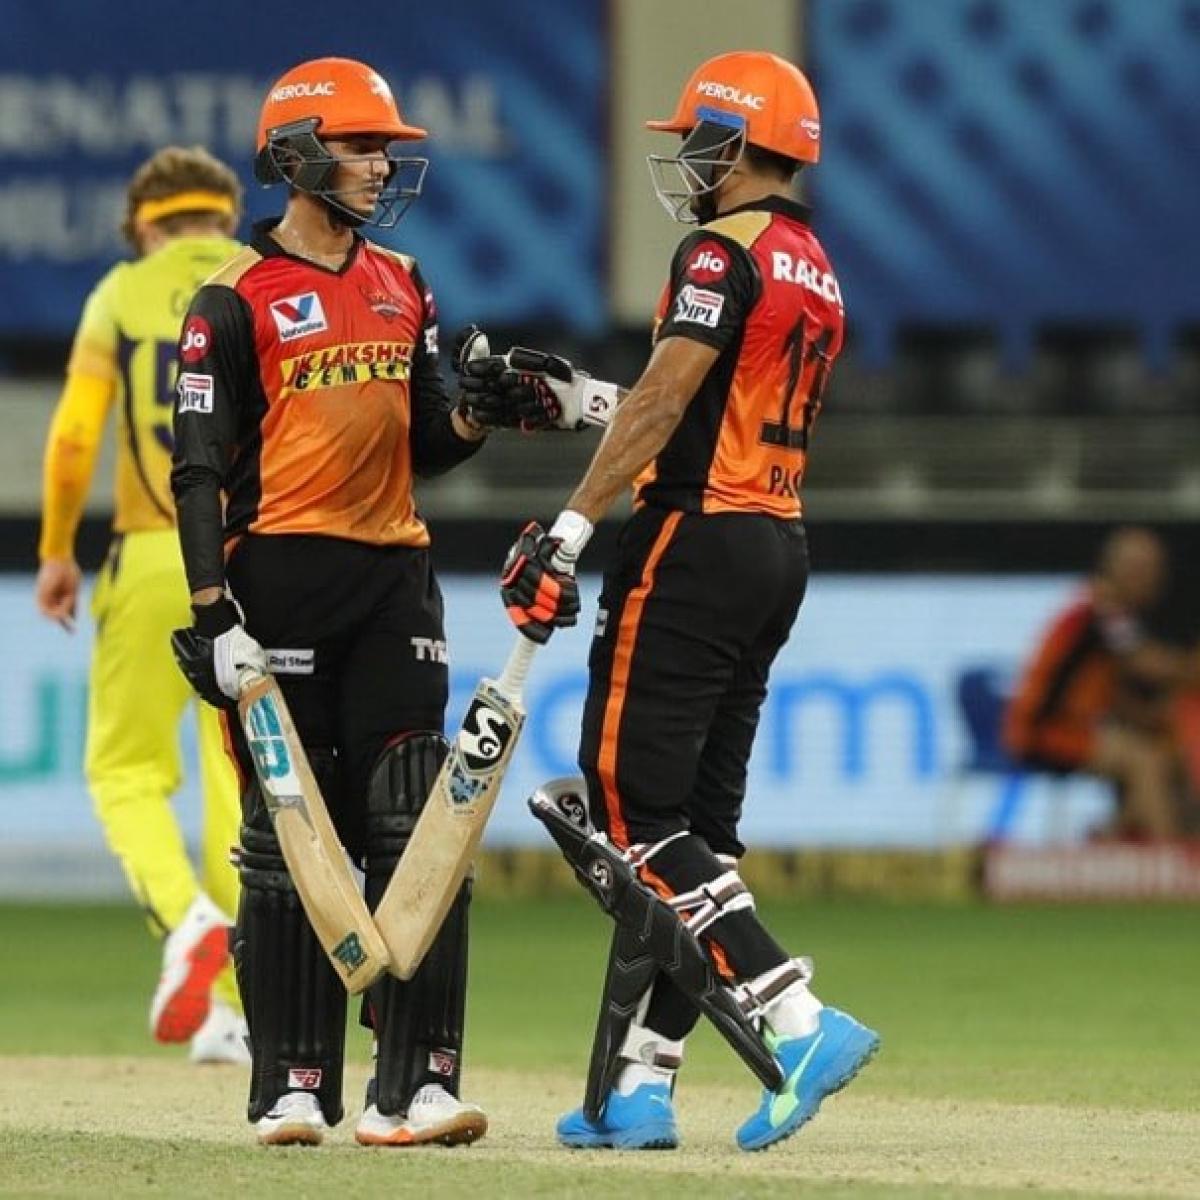 'Under 19 guys smashing senior guys': Twitter amazed as Priyam Garg scores stunning 50 against CSK